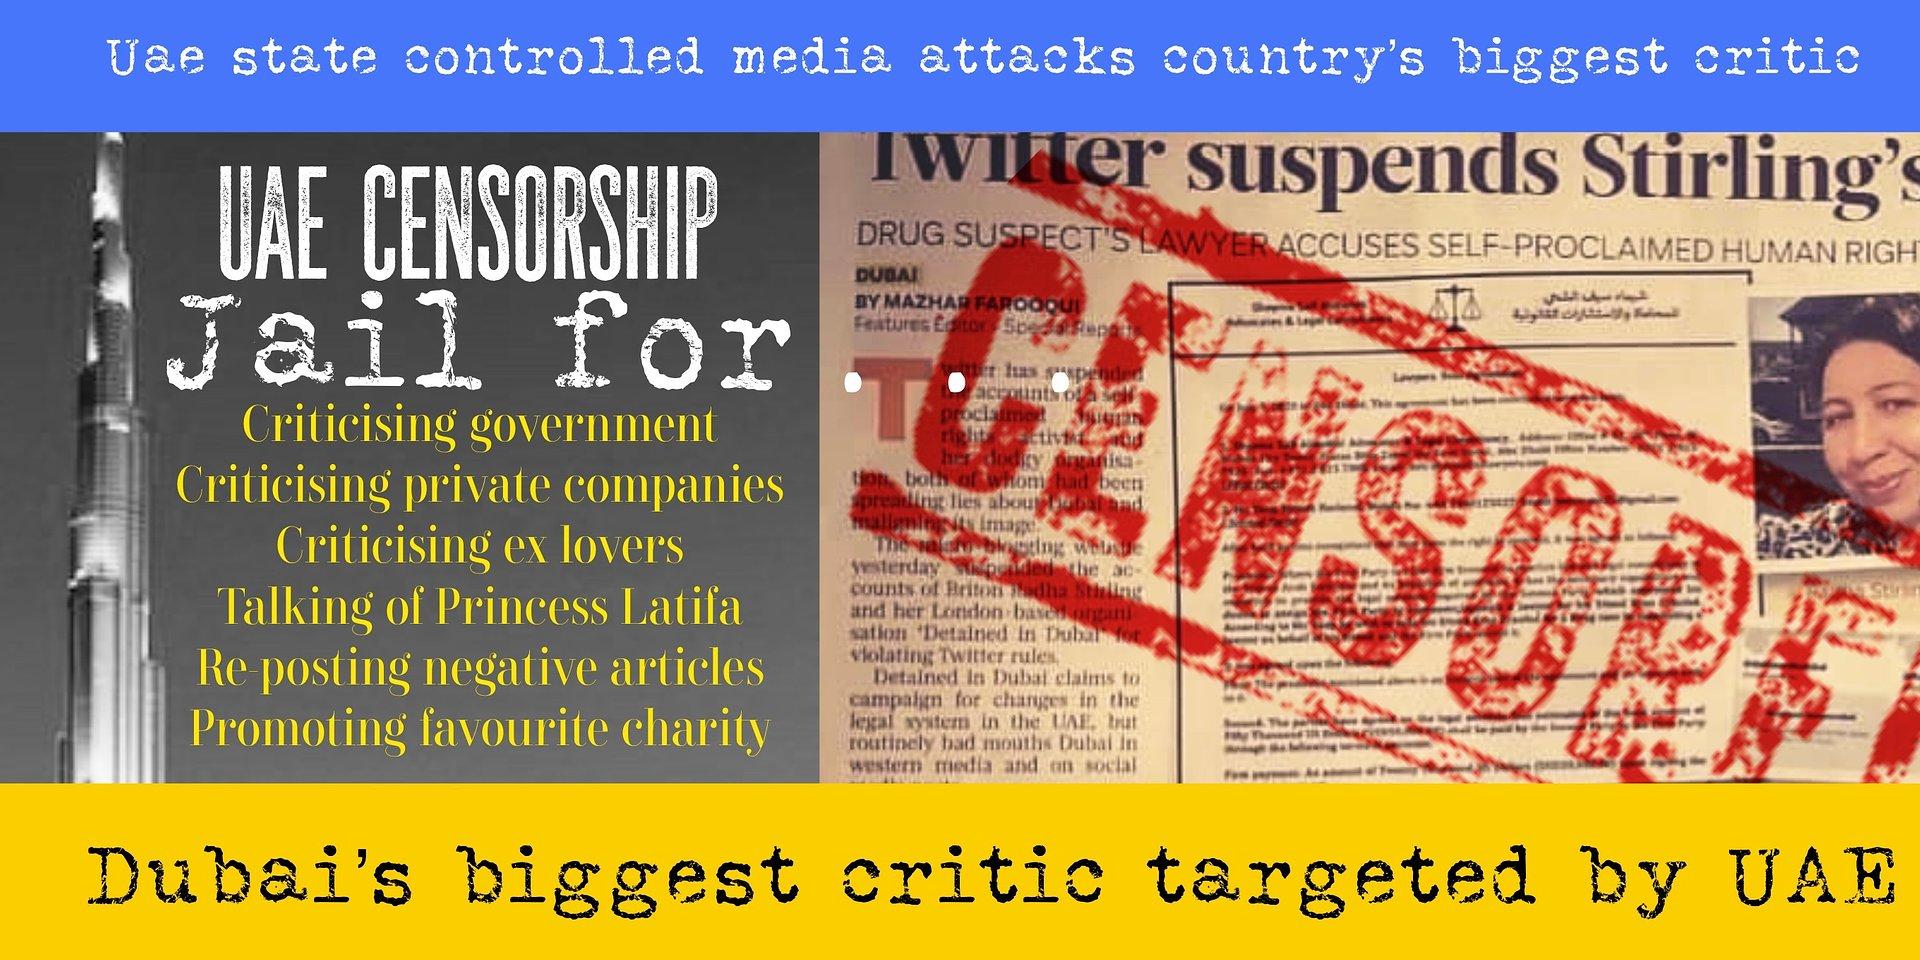 Censorship of Dubai's biggest critic on Twitter sparks concern